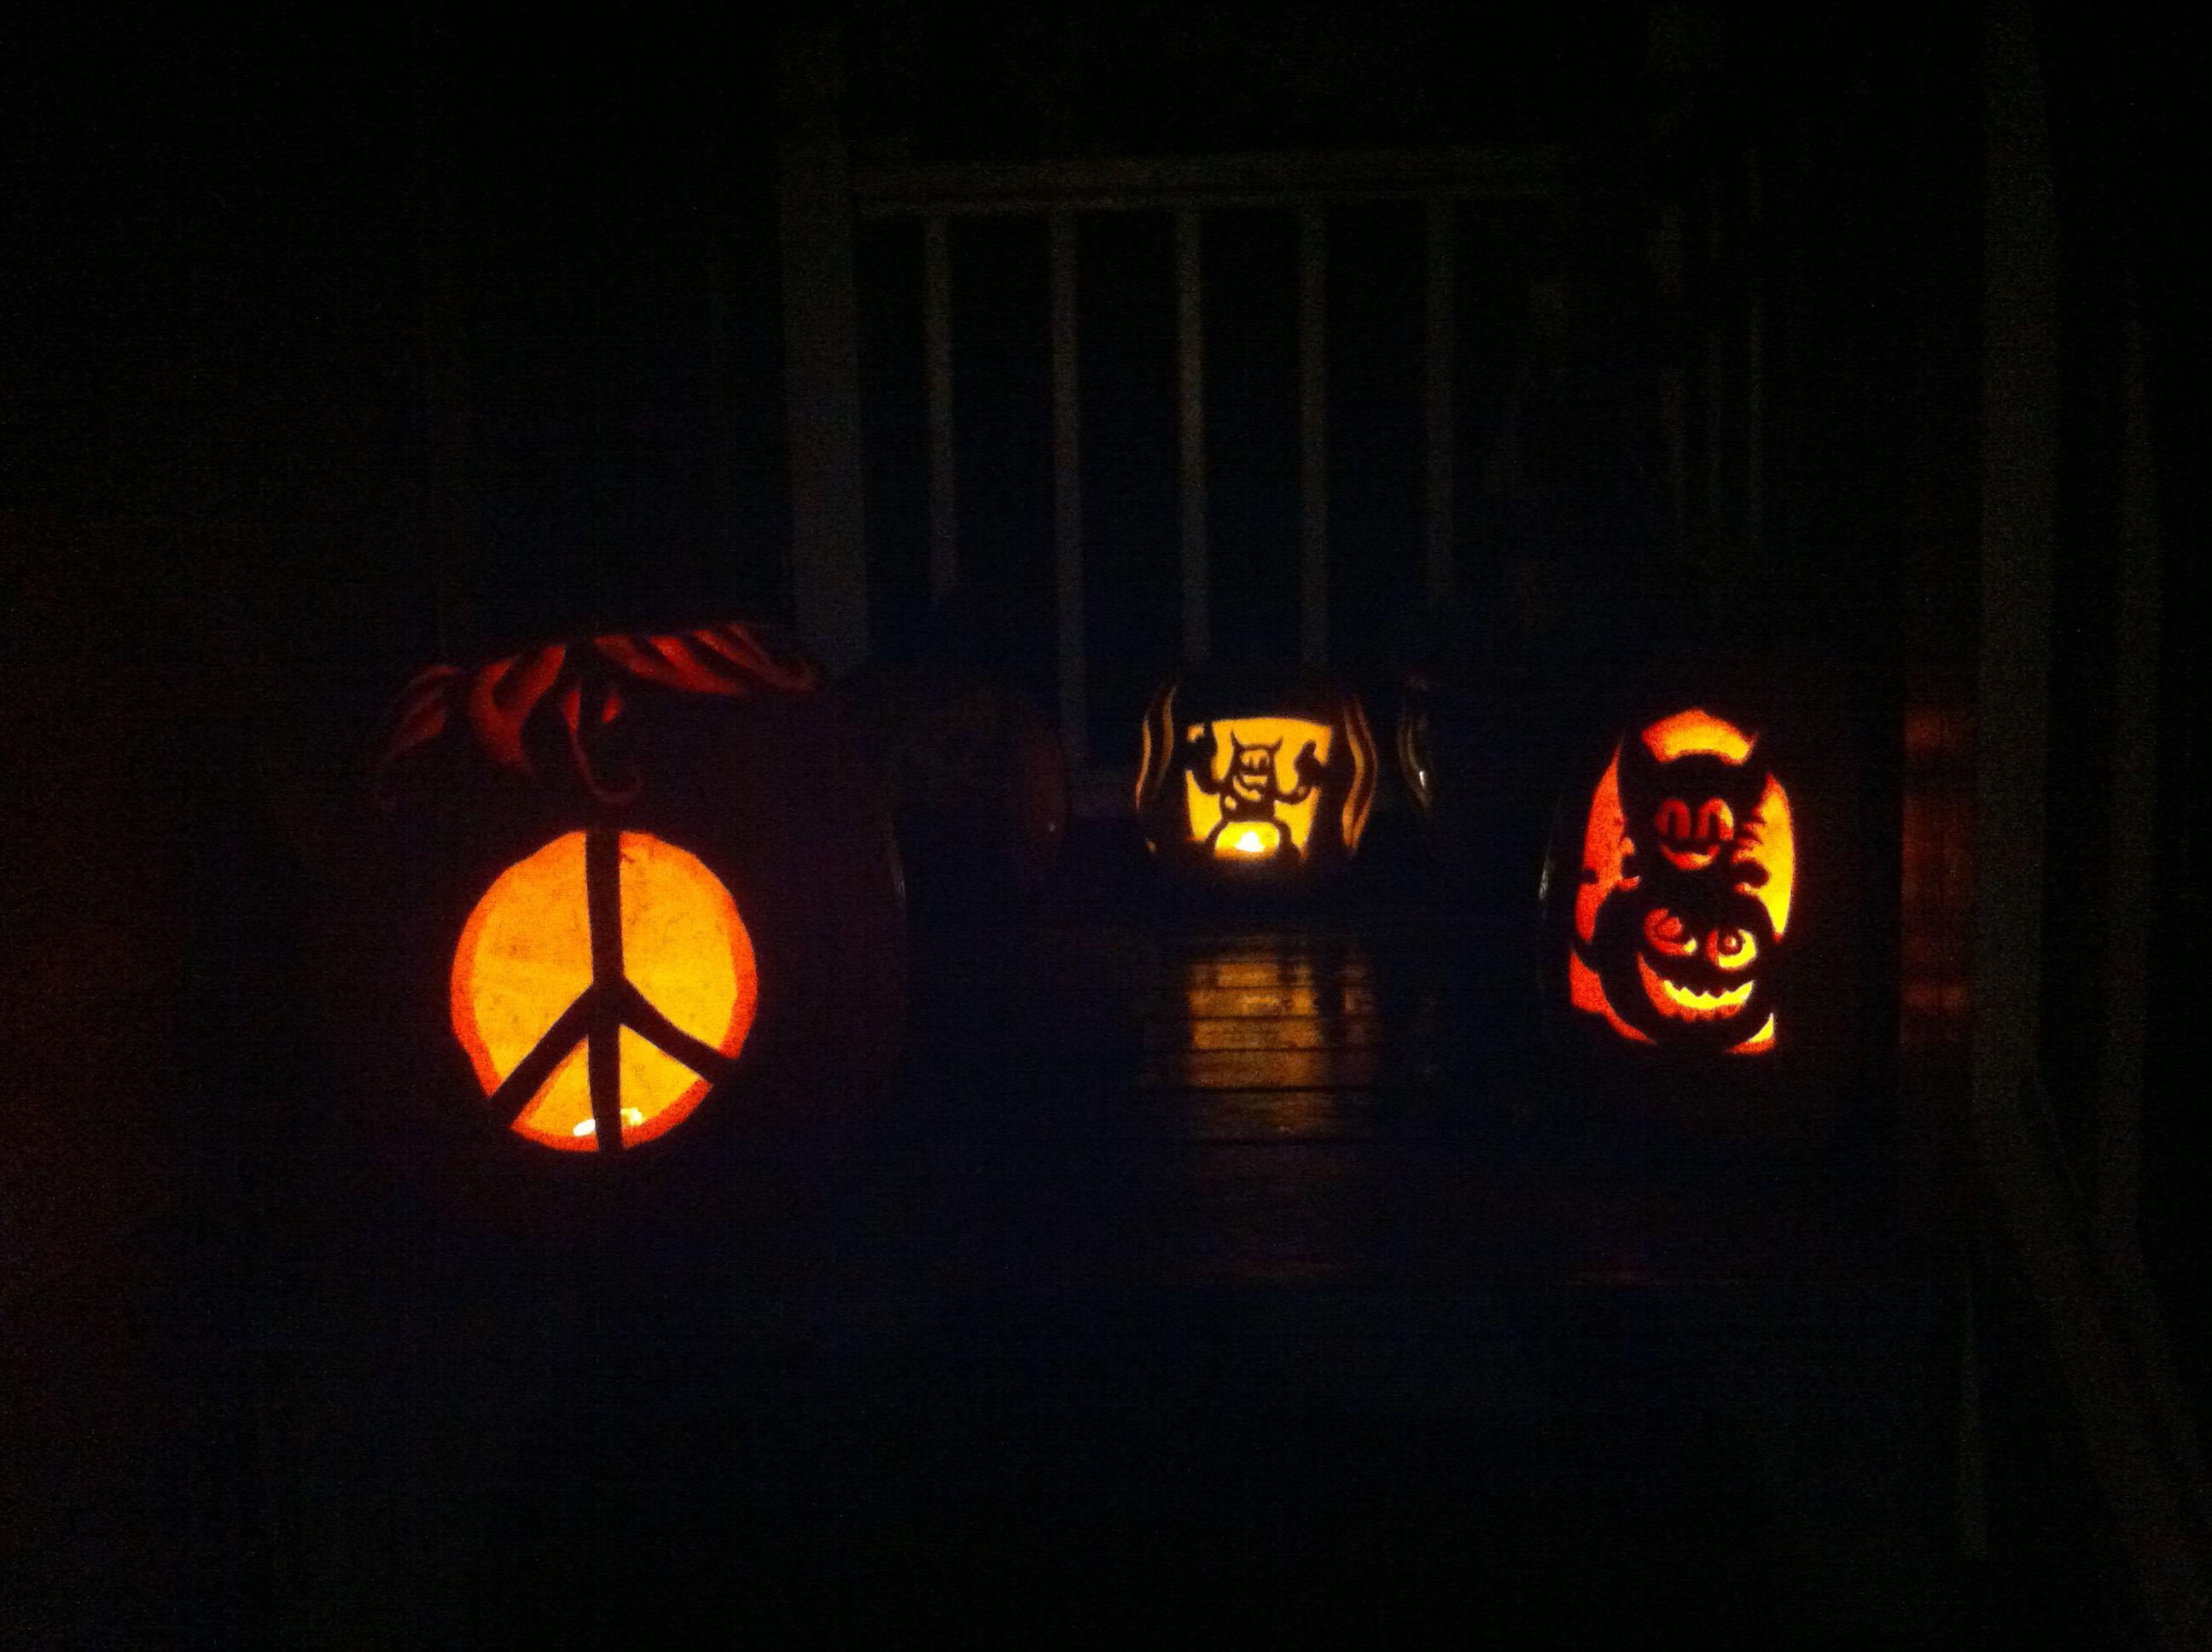 Family affair... Pumpkin party!